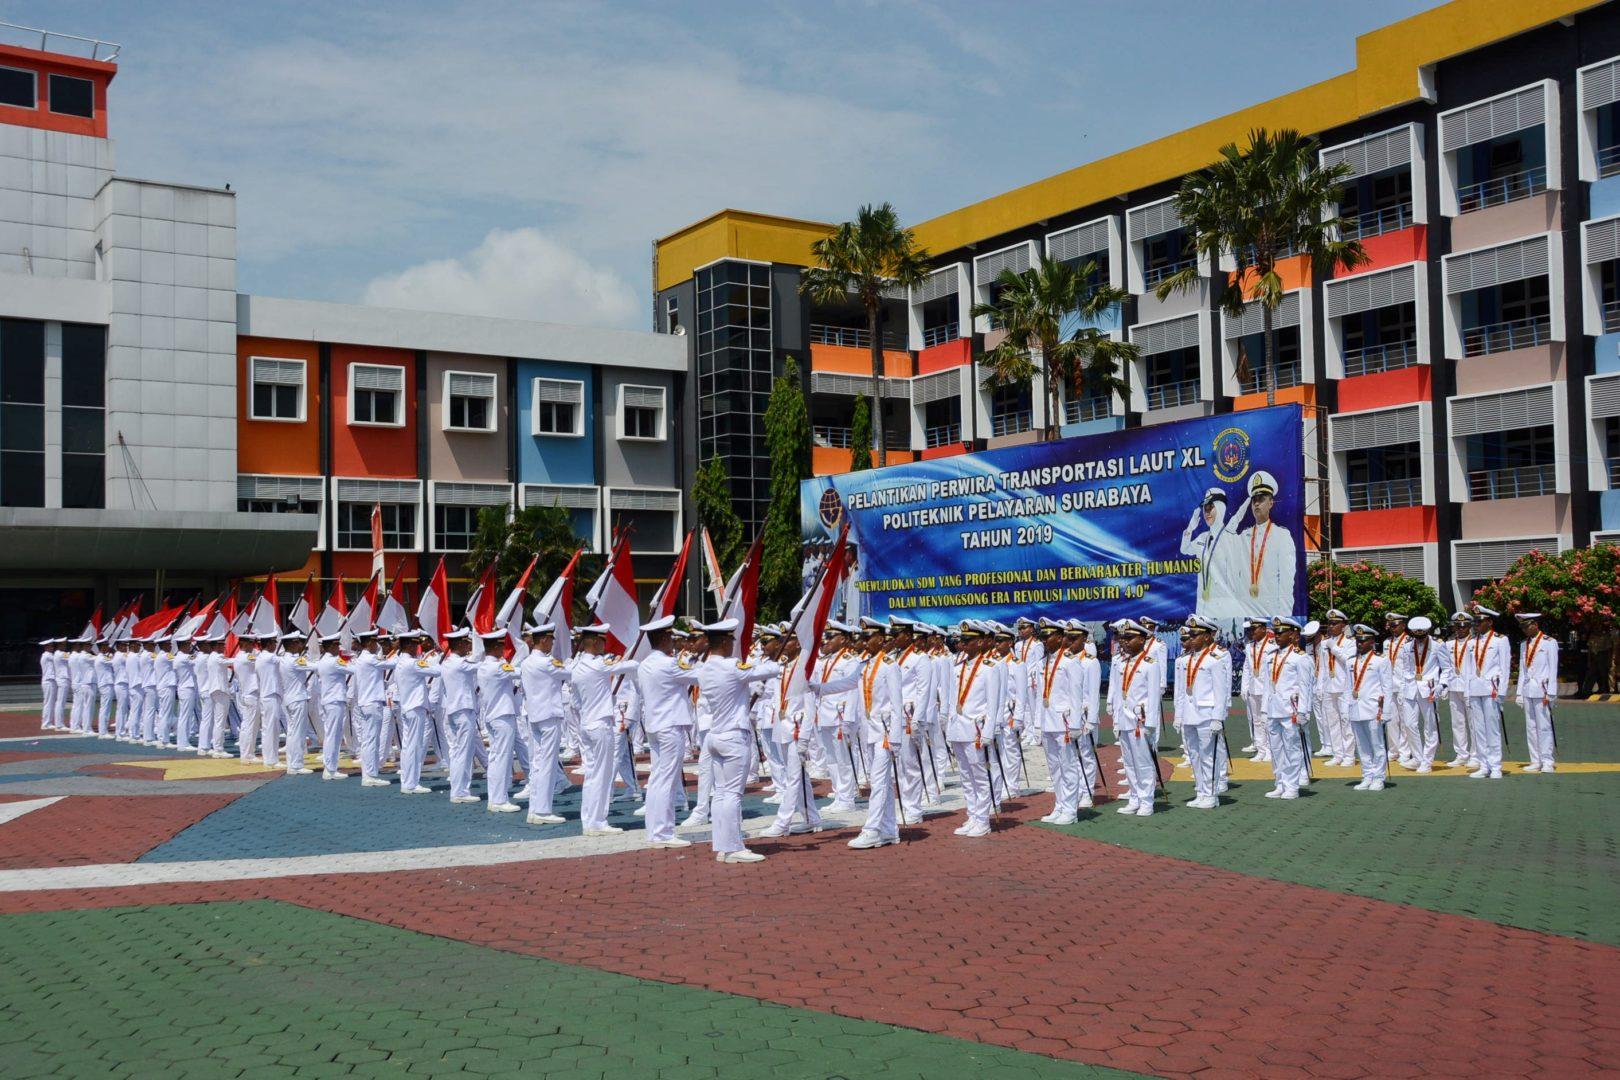 Penerimaan Polbit Poltekpel Surabaya